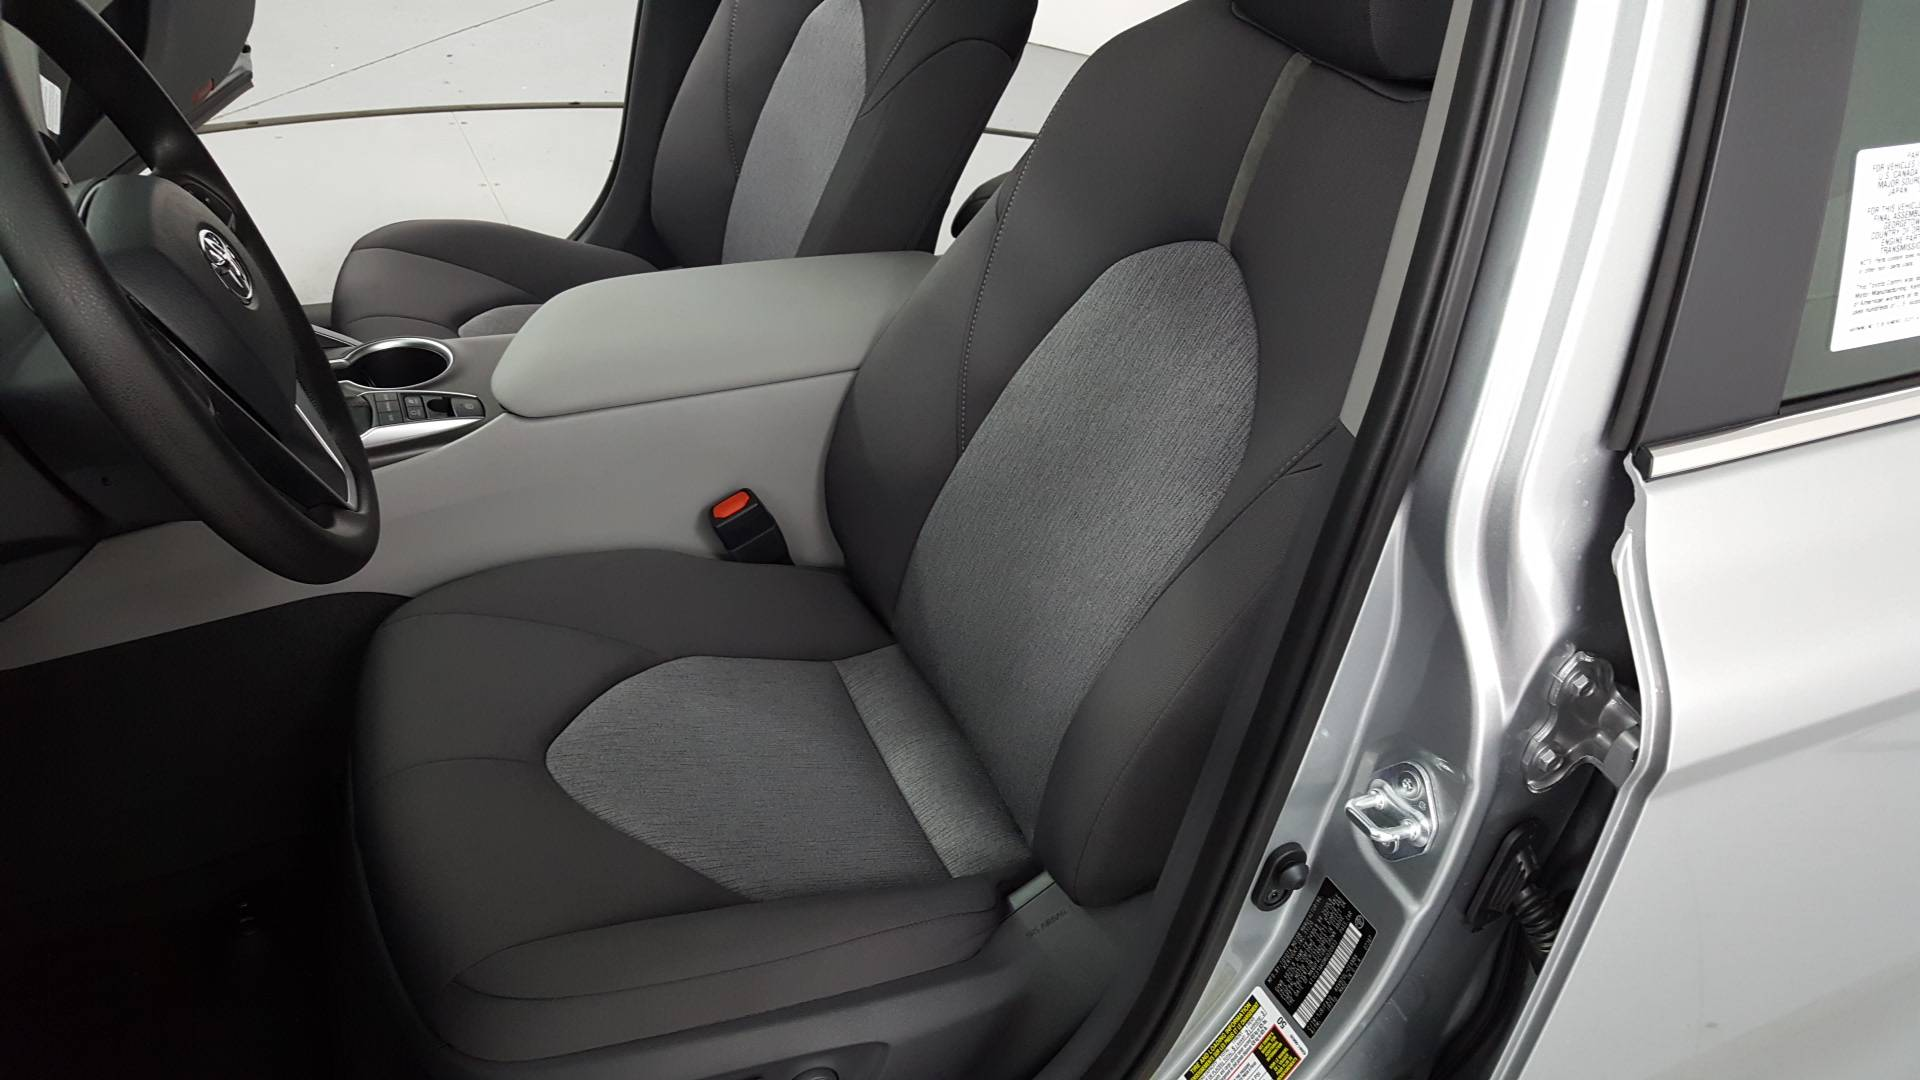 2021 Toyota Camry Hybrid 4dr Car